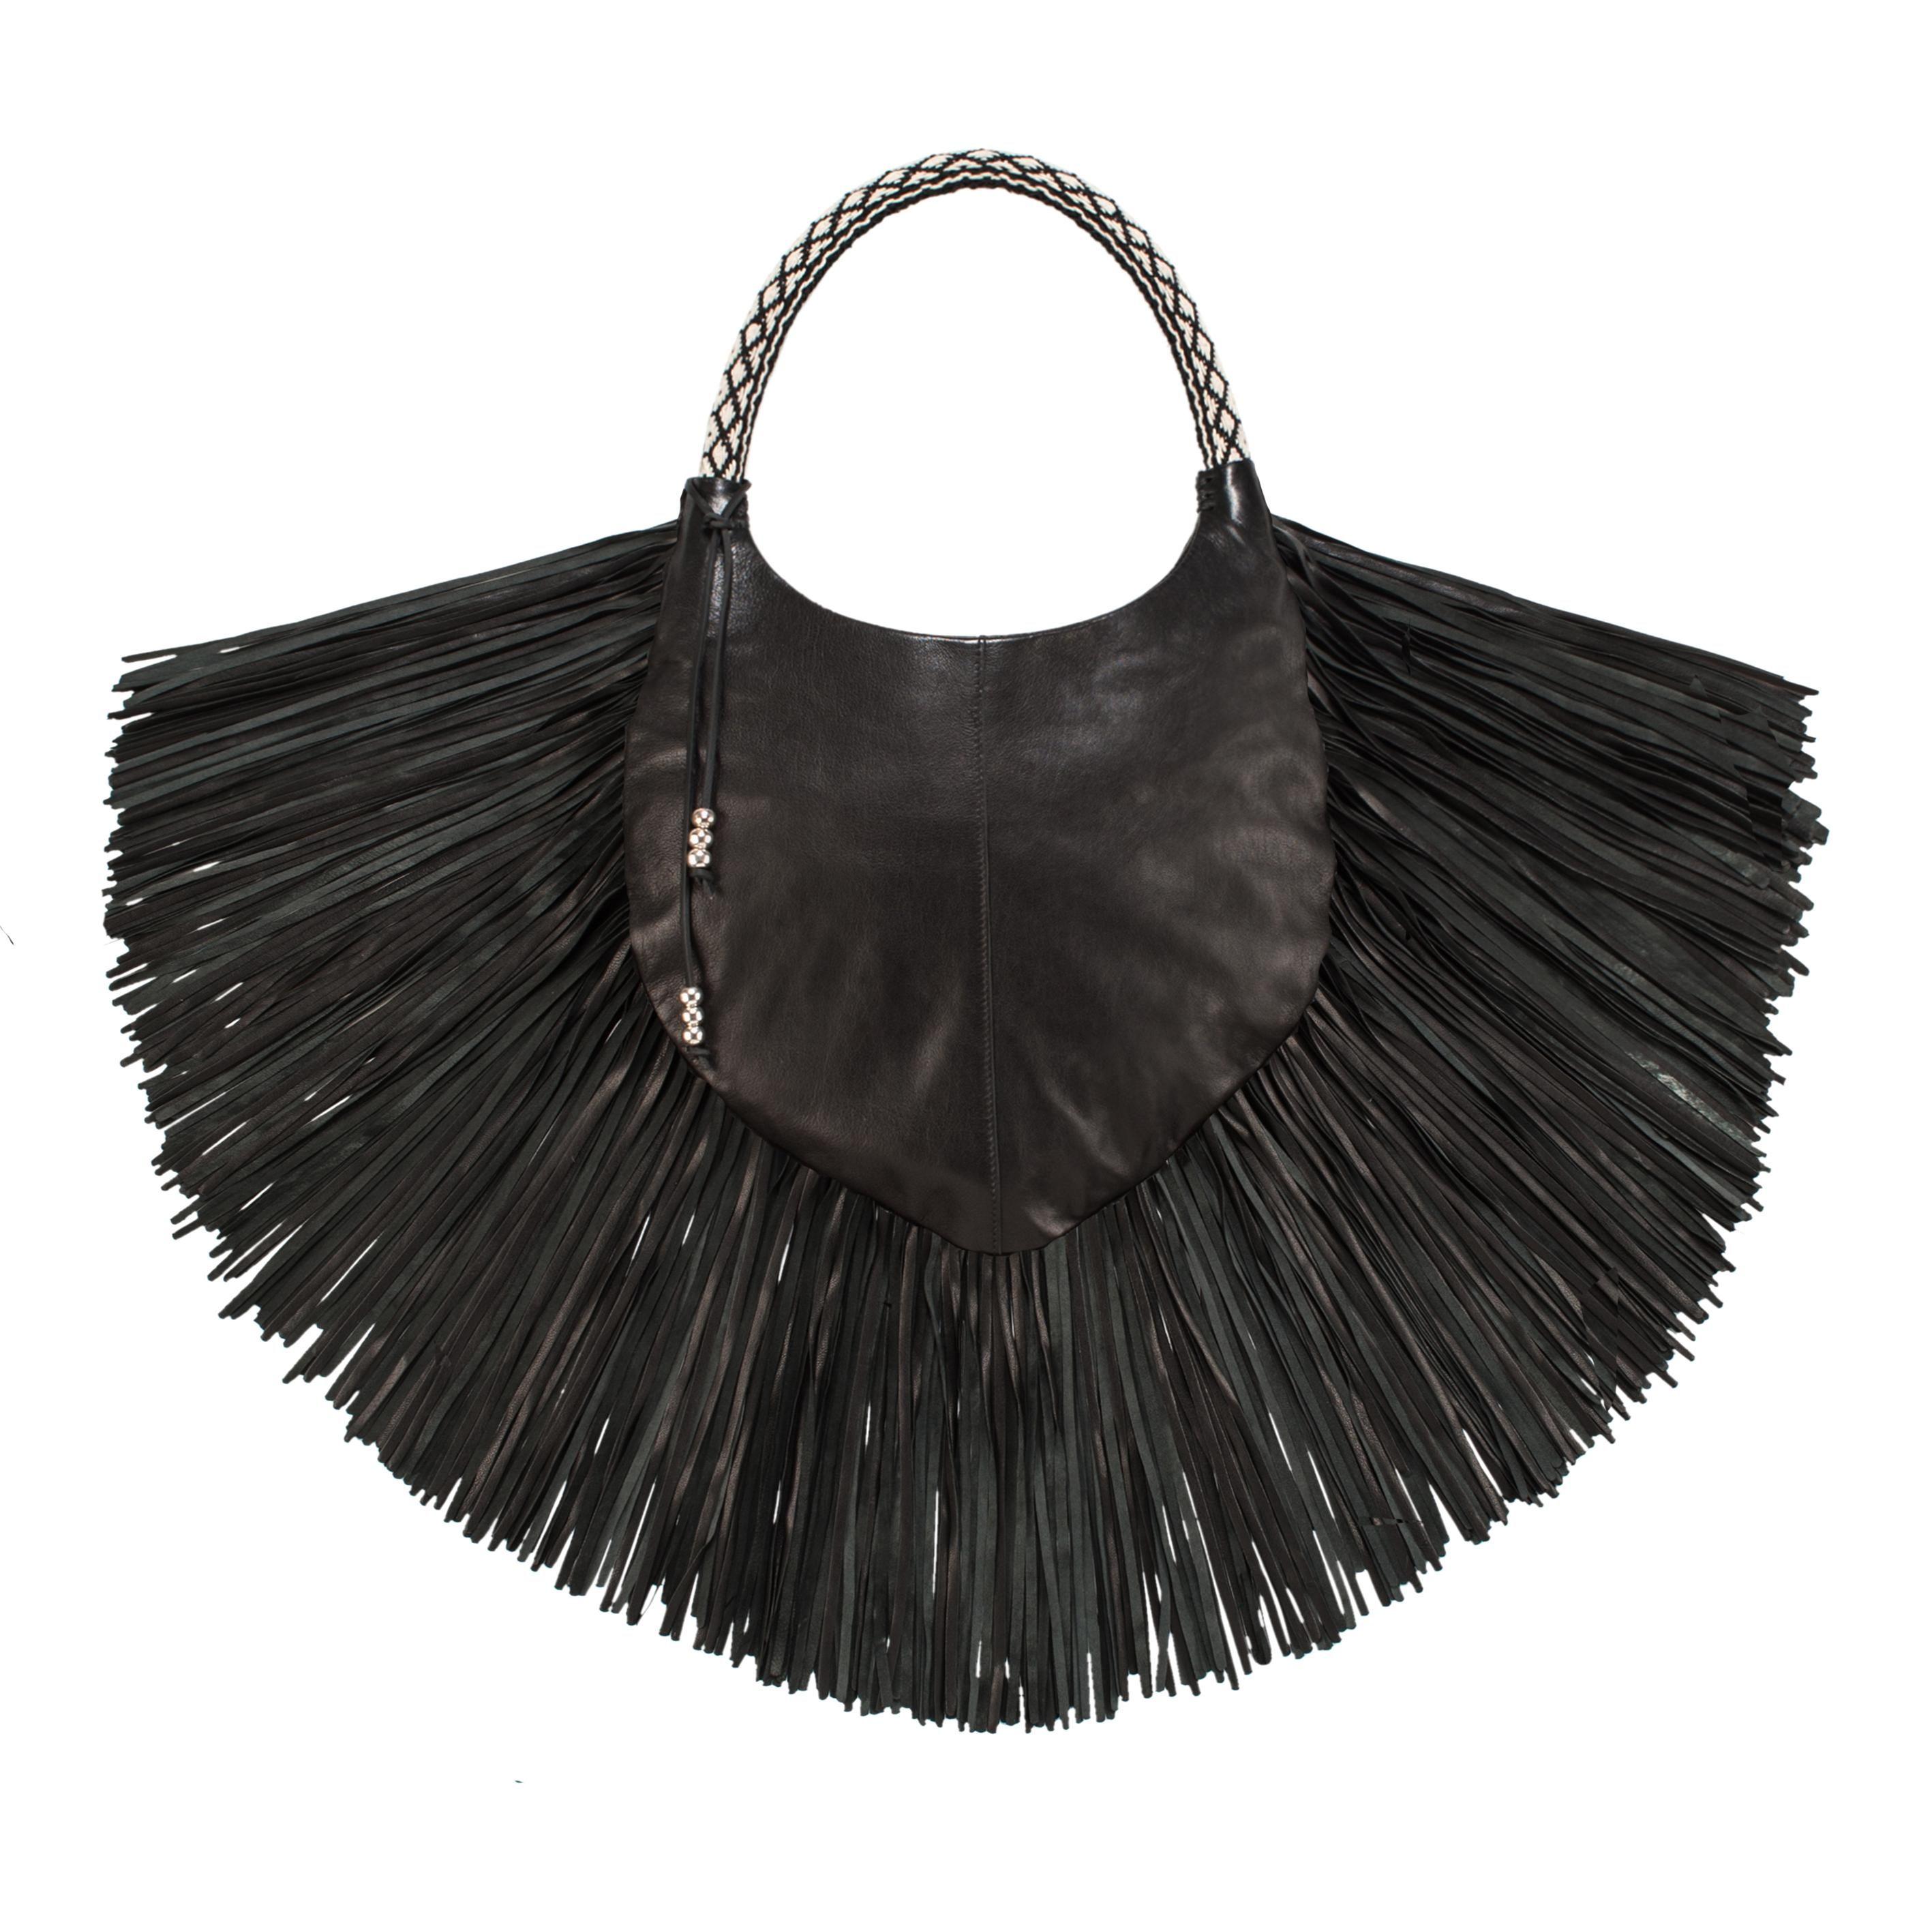 Tribal Fringe Bag on AHAlife, Barbara Bonner, $1,088